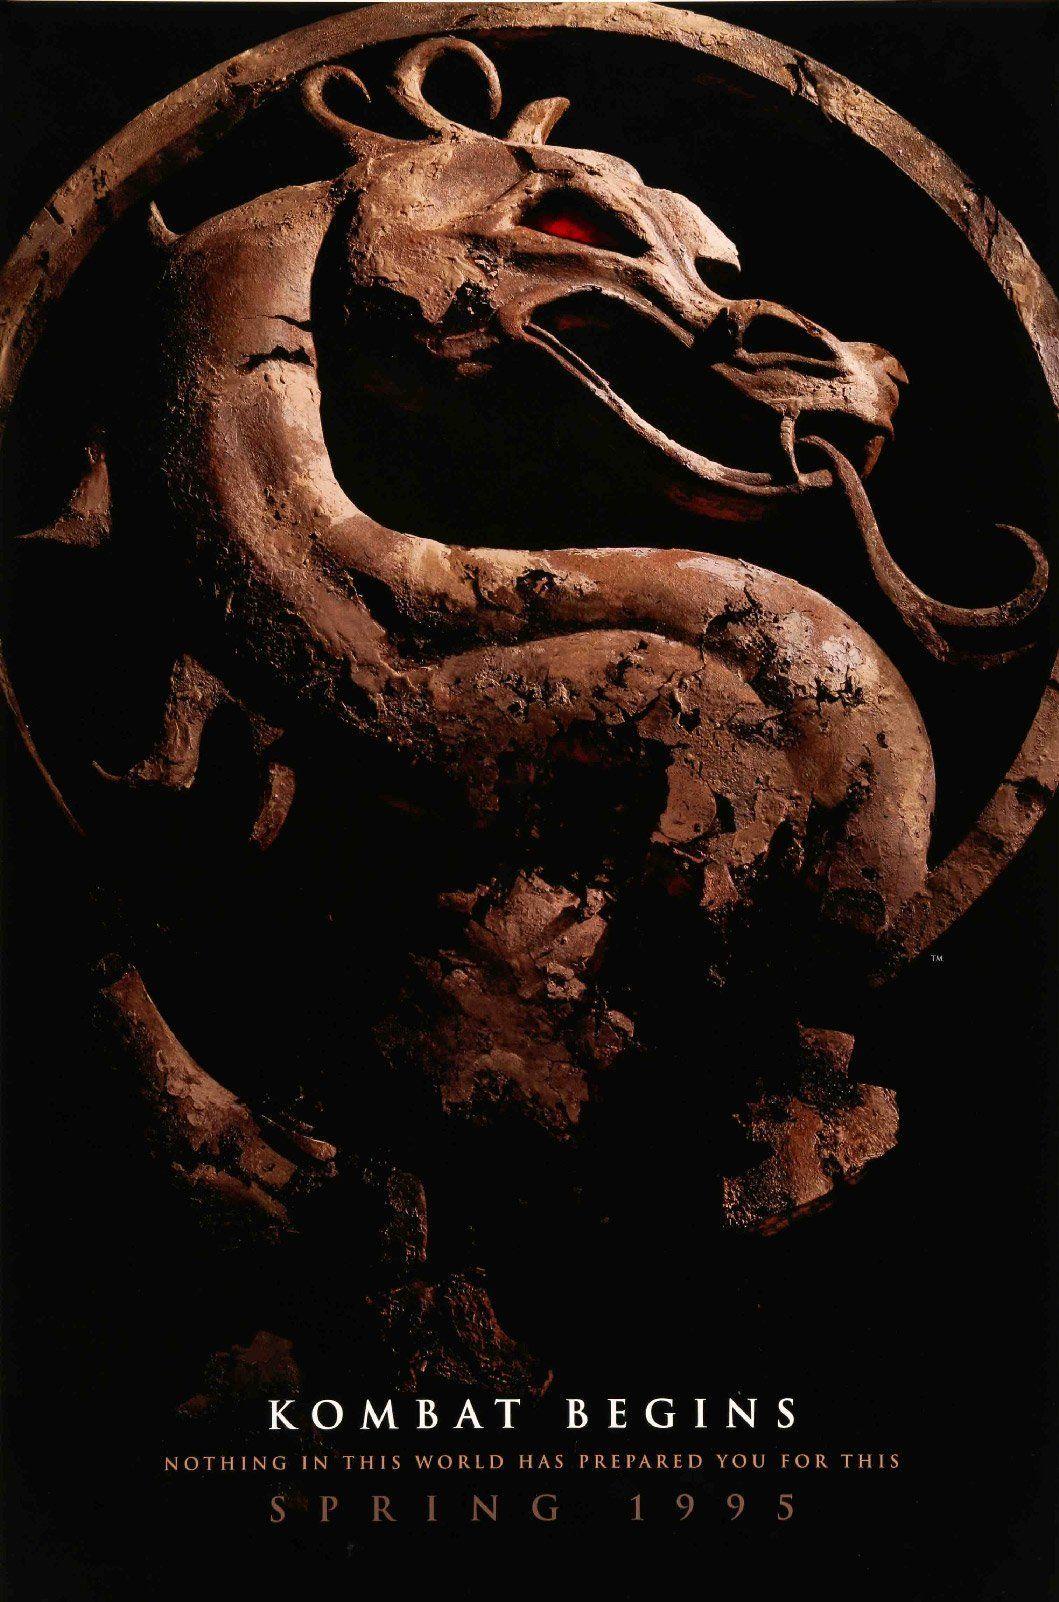 Mortal kombat 1995 mortal kombat movie posters 1995